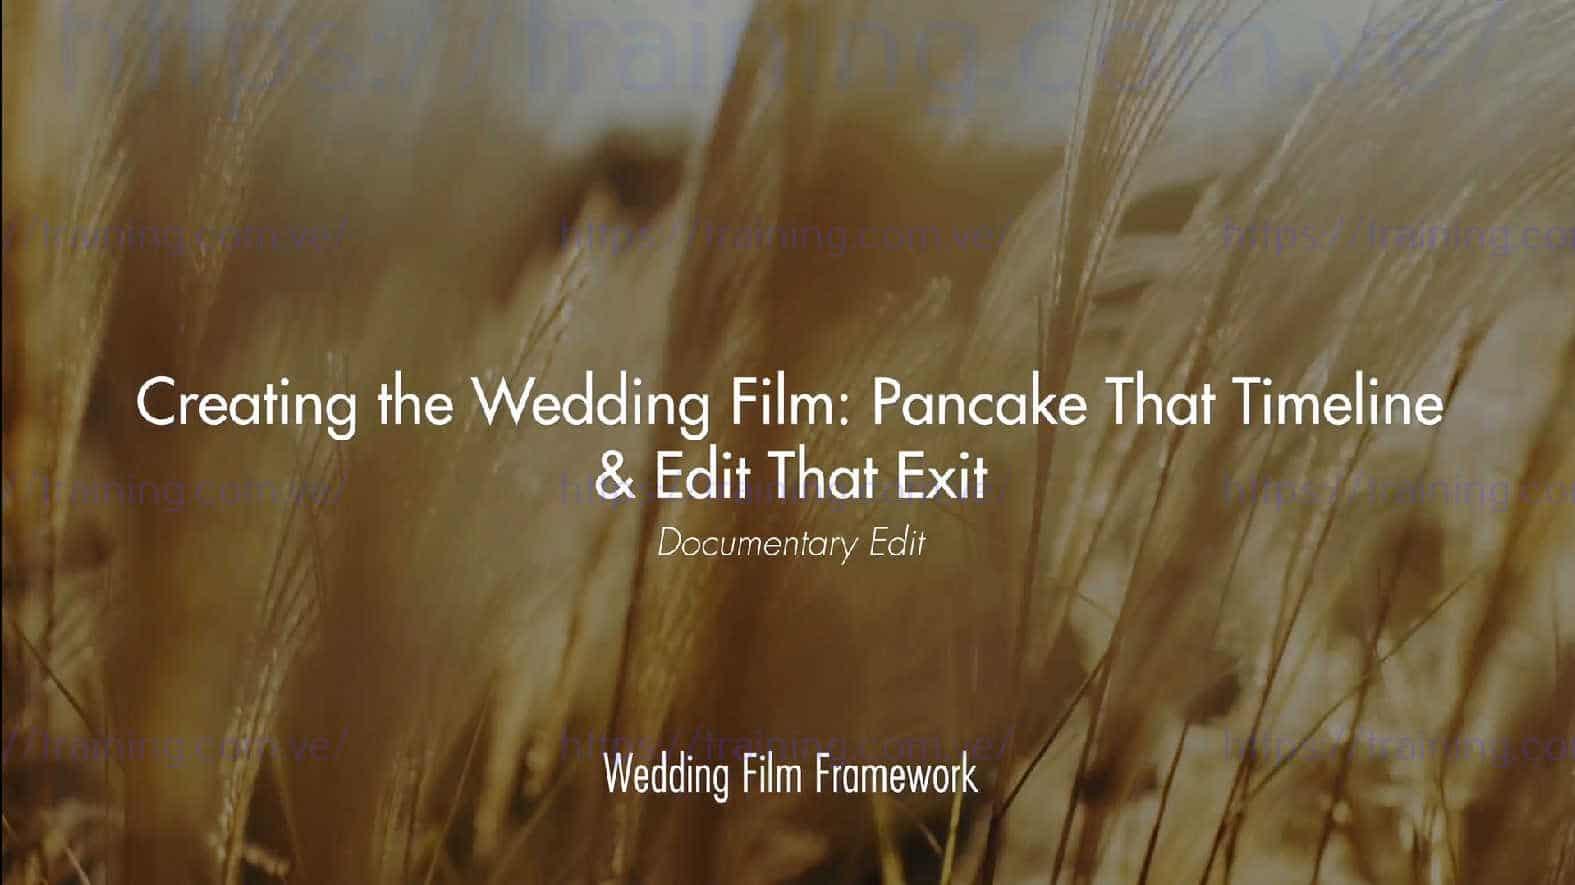 Wedding Film Framework by Matt Johnson 1